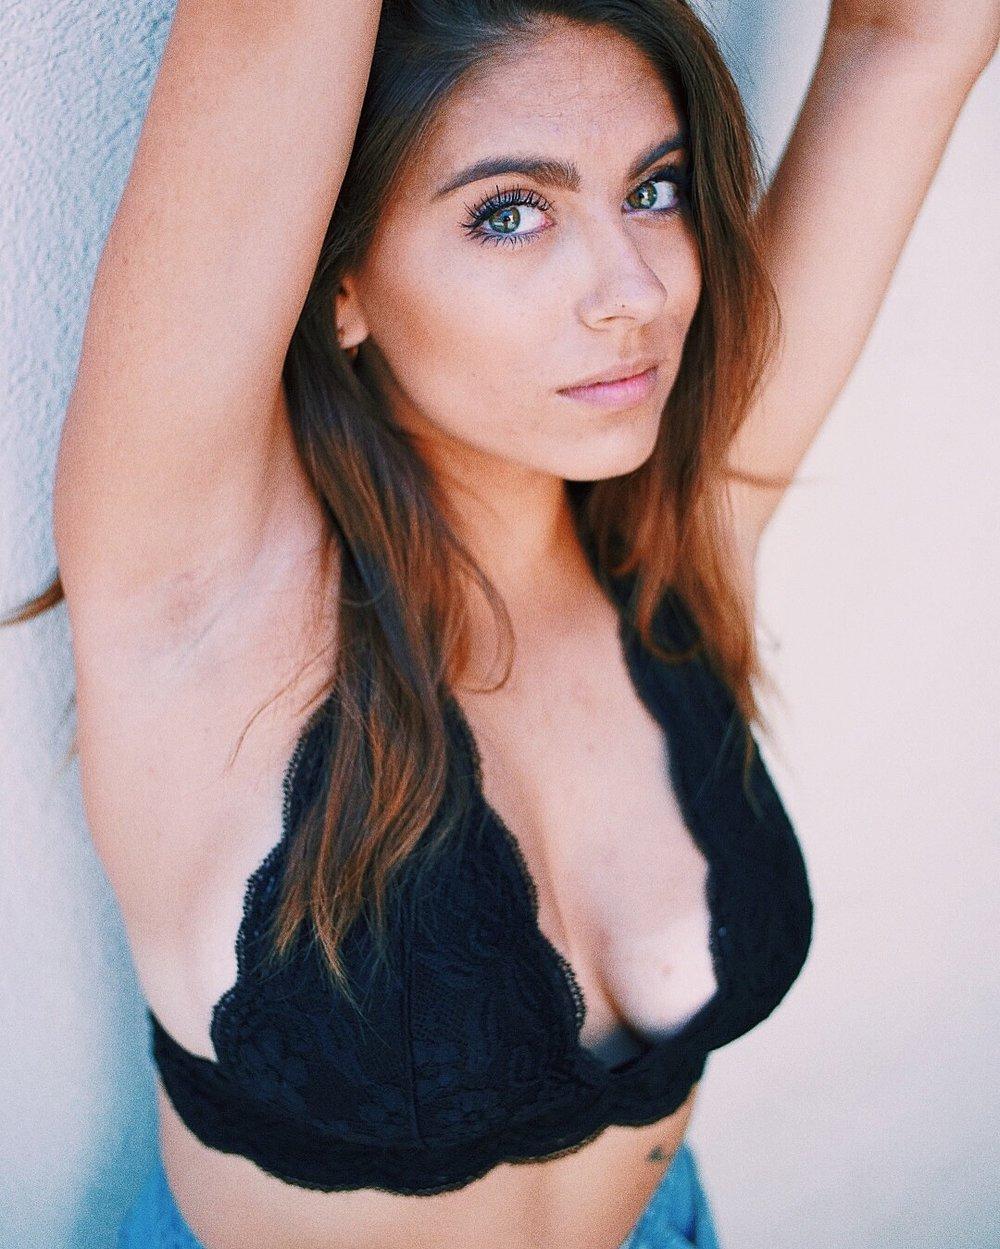 ChloeJane Busick